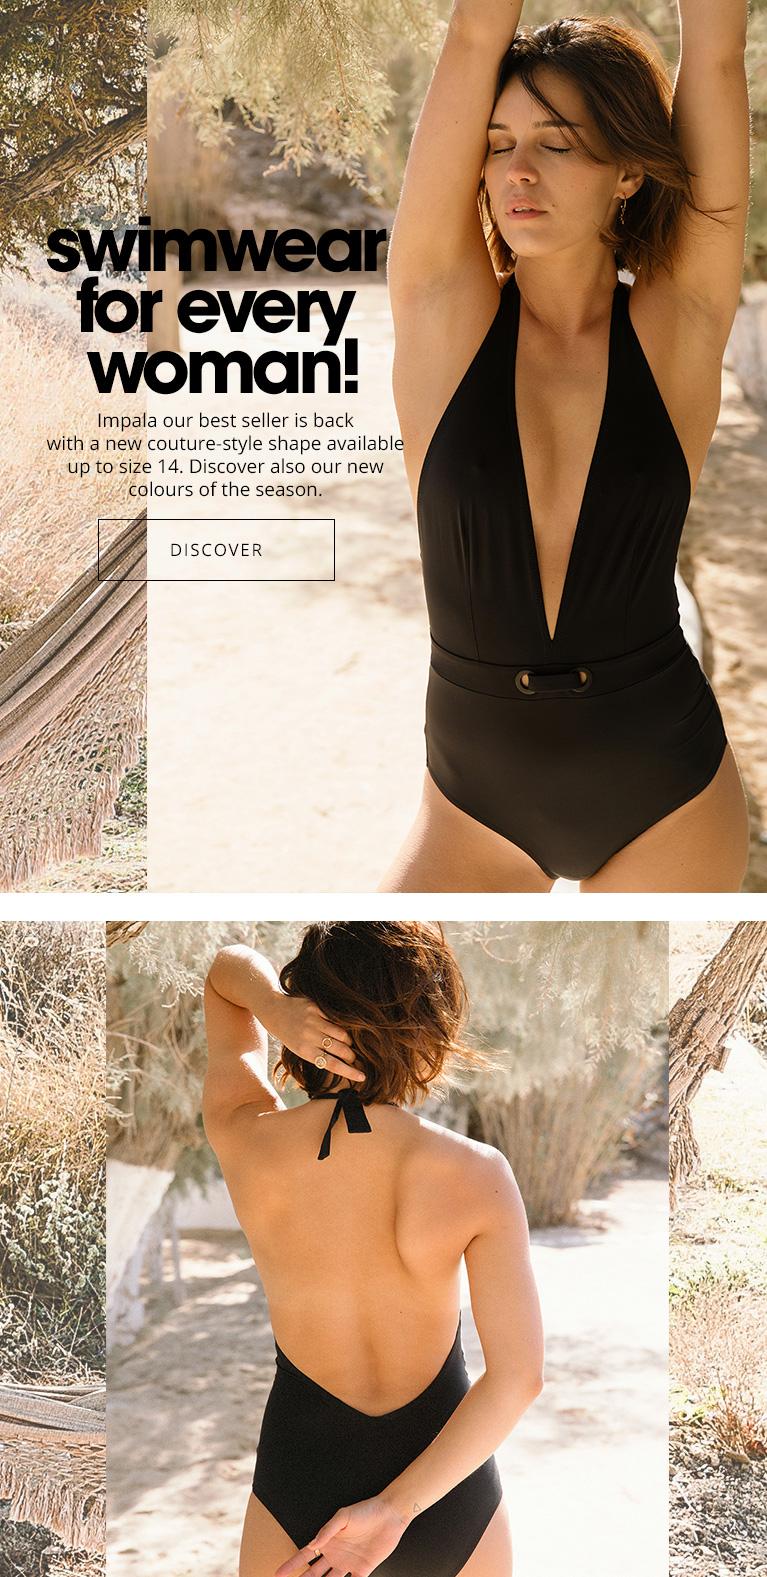 Swimwear for every woman!